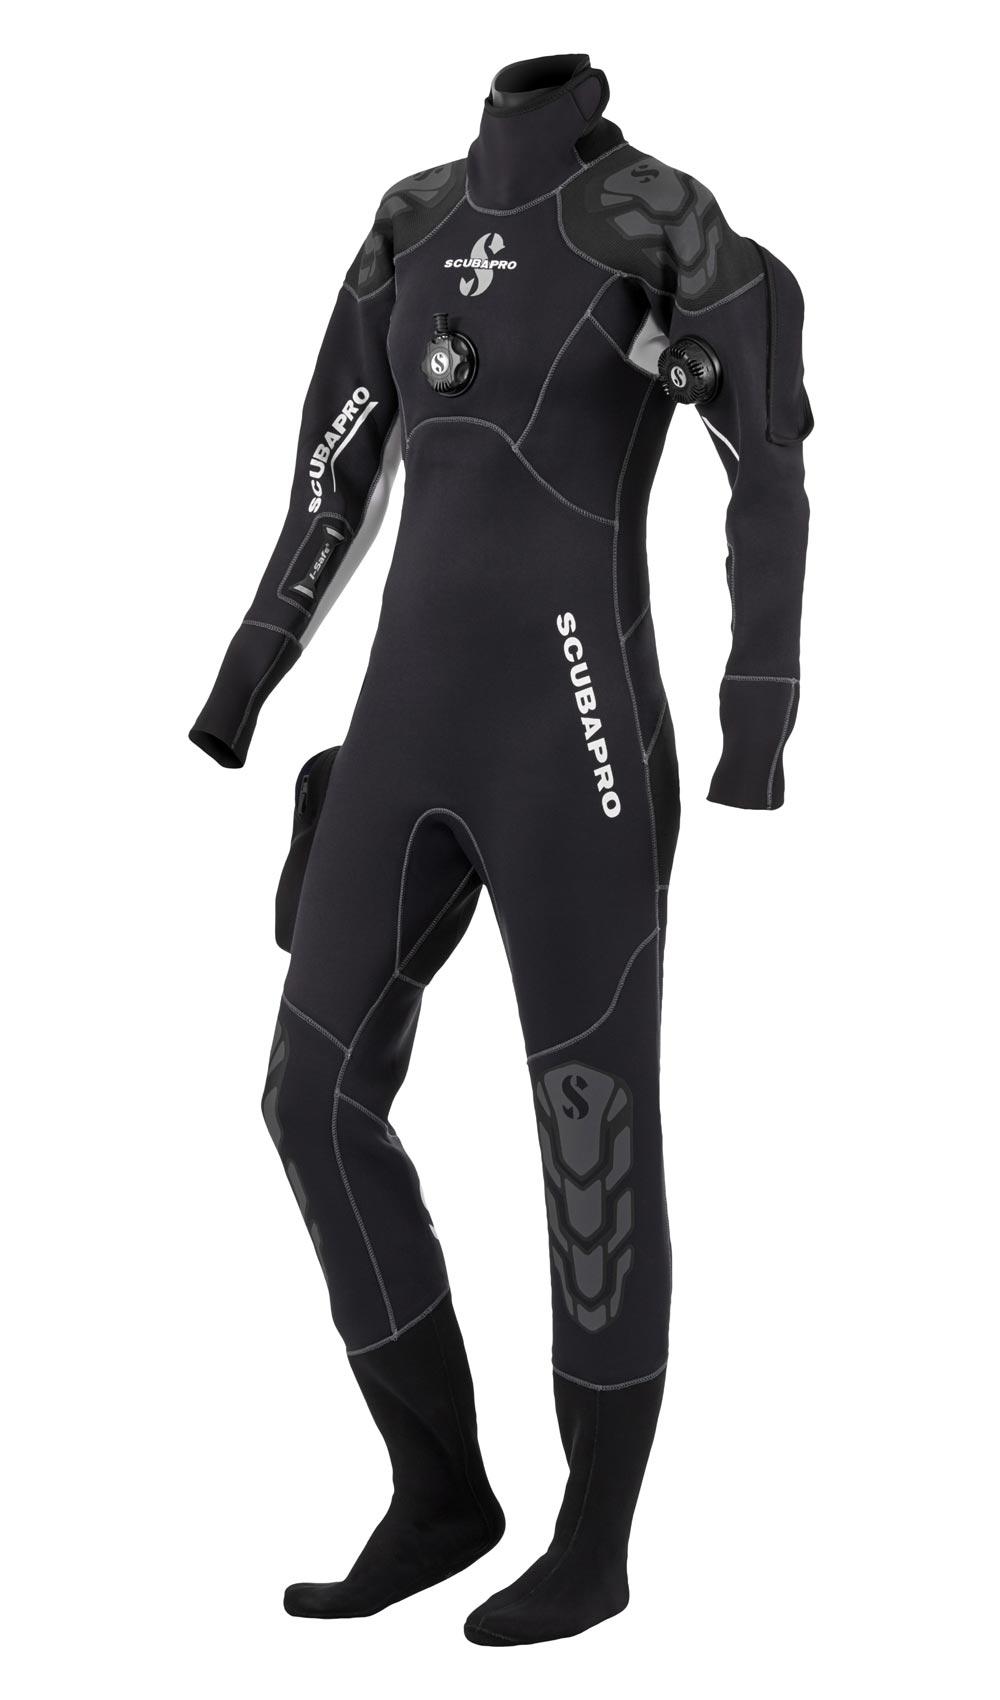 Сух водолазен костюм от компресиран неопрен EVERDRY Lady 4 мм - Scubapro